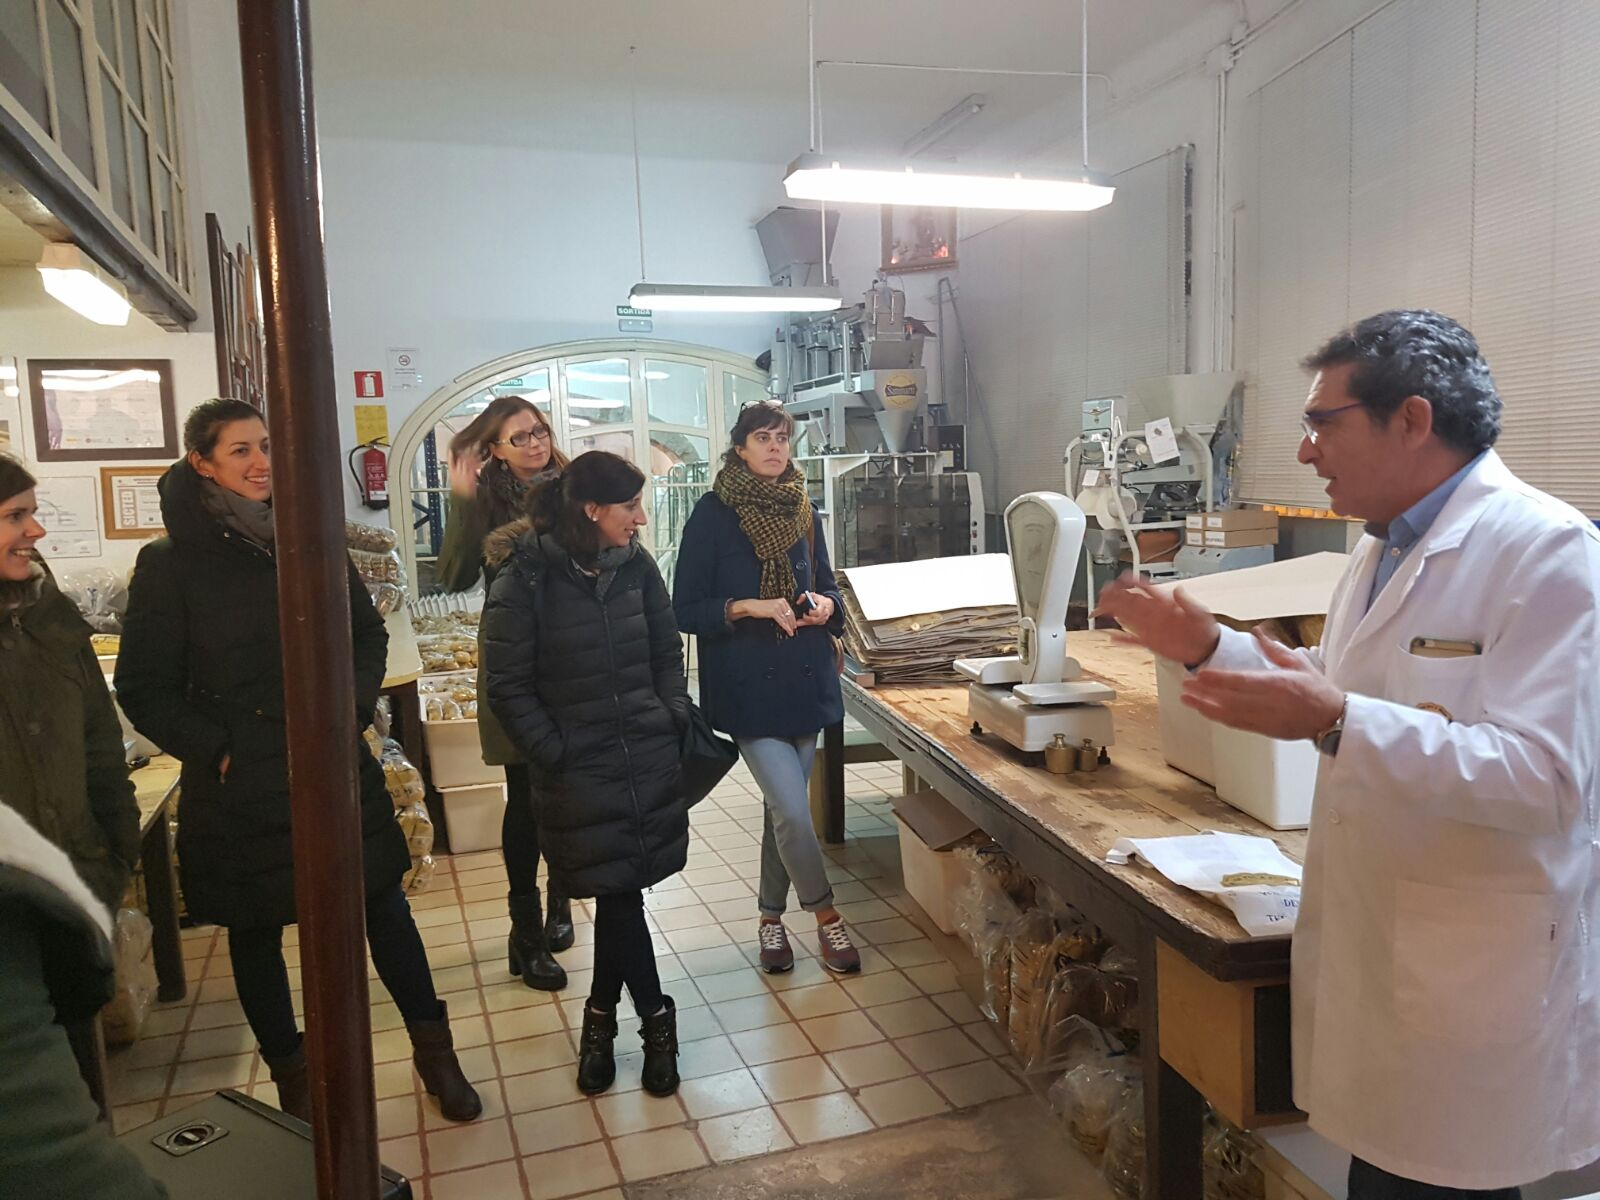 Vista a la fàbrica de pasta Pastes Sanmartí